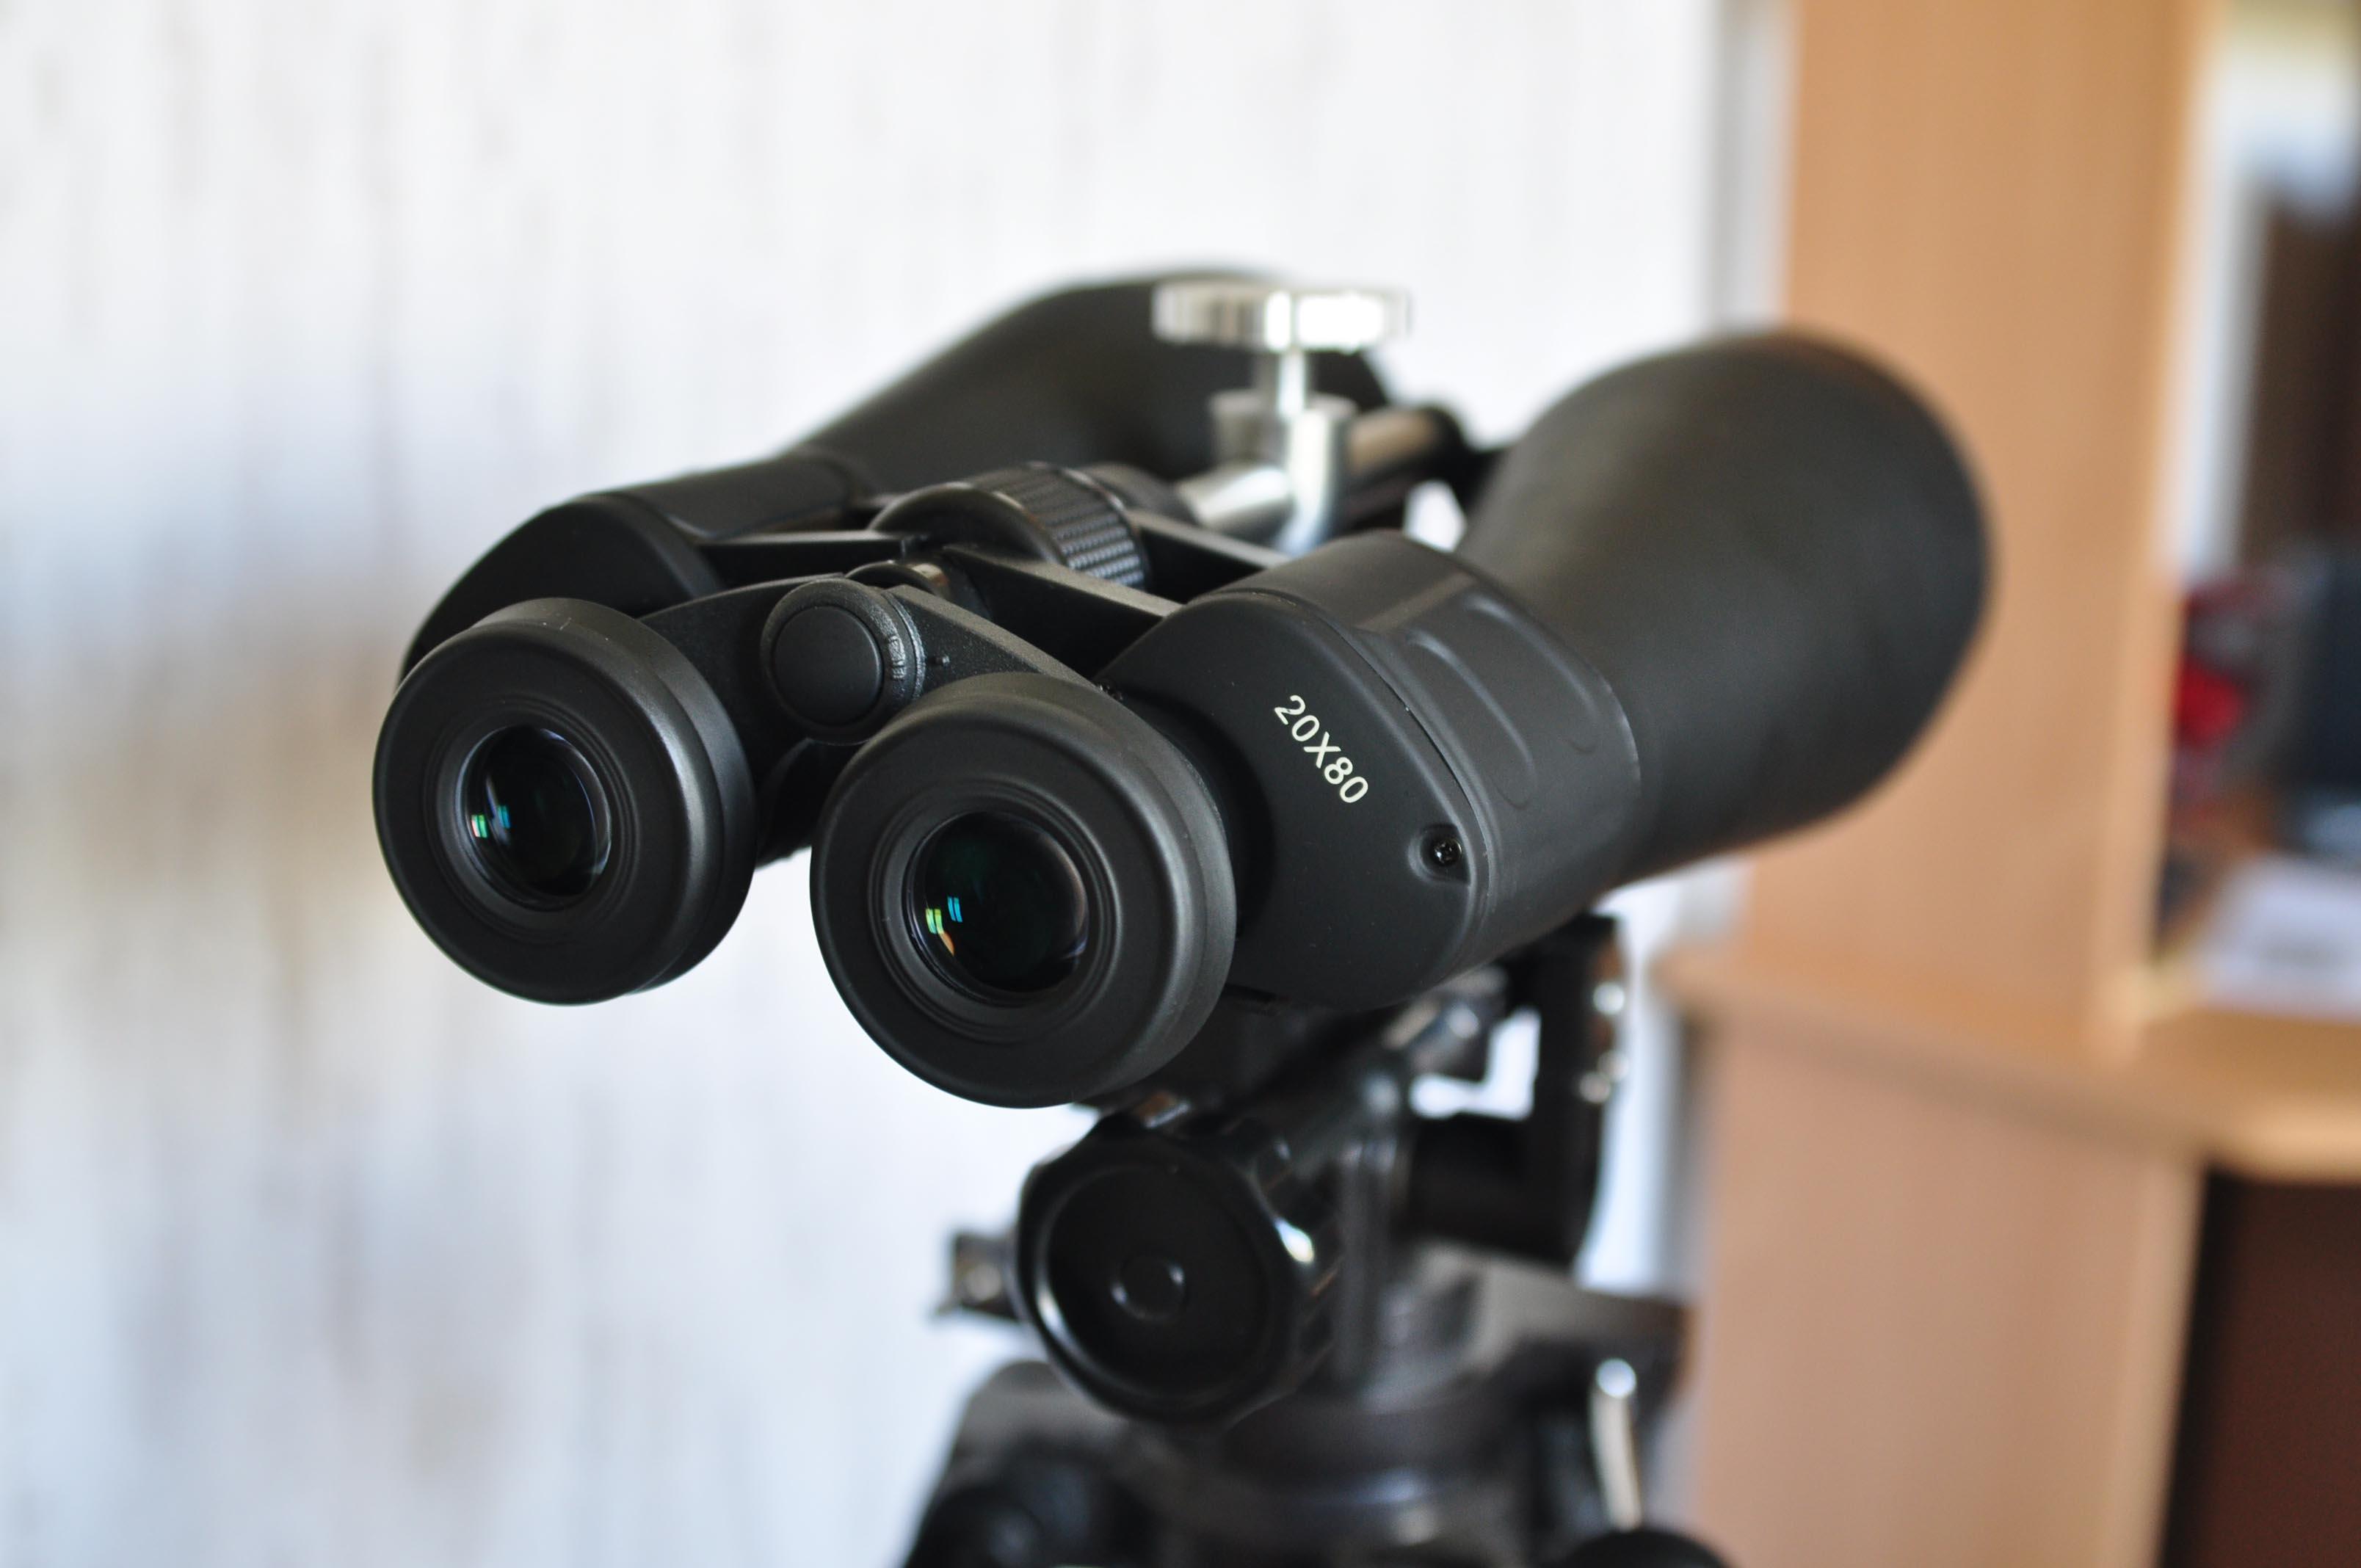 Lornetka astronomiczna Bresser SPECIAL ASTRO 20x80